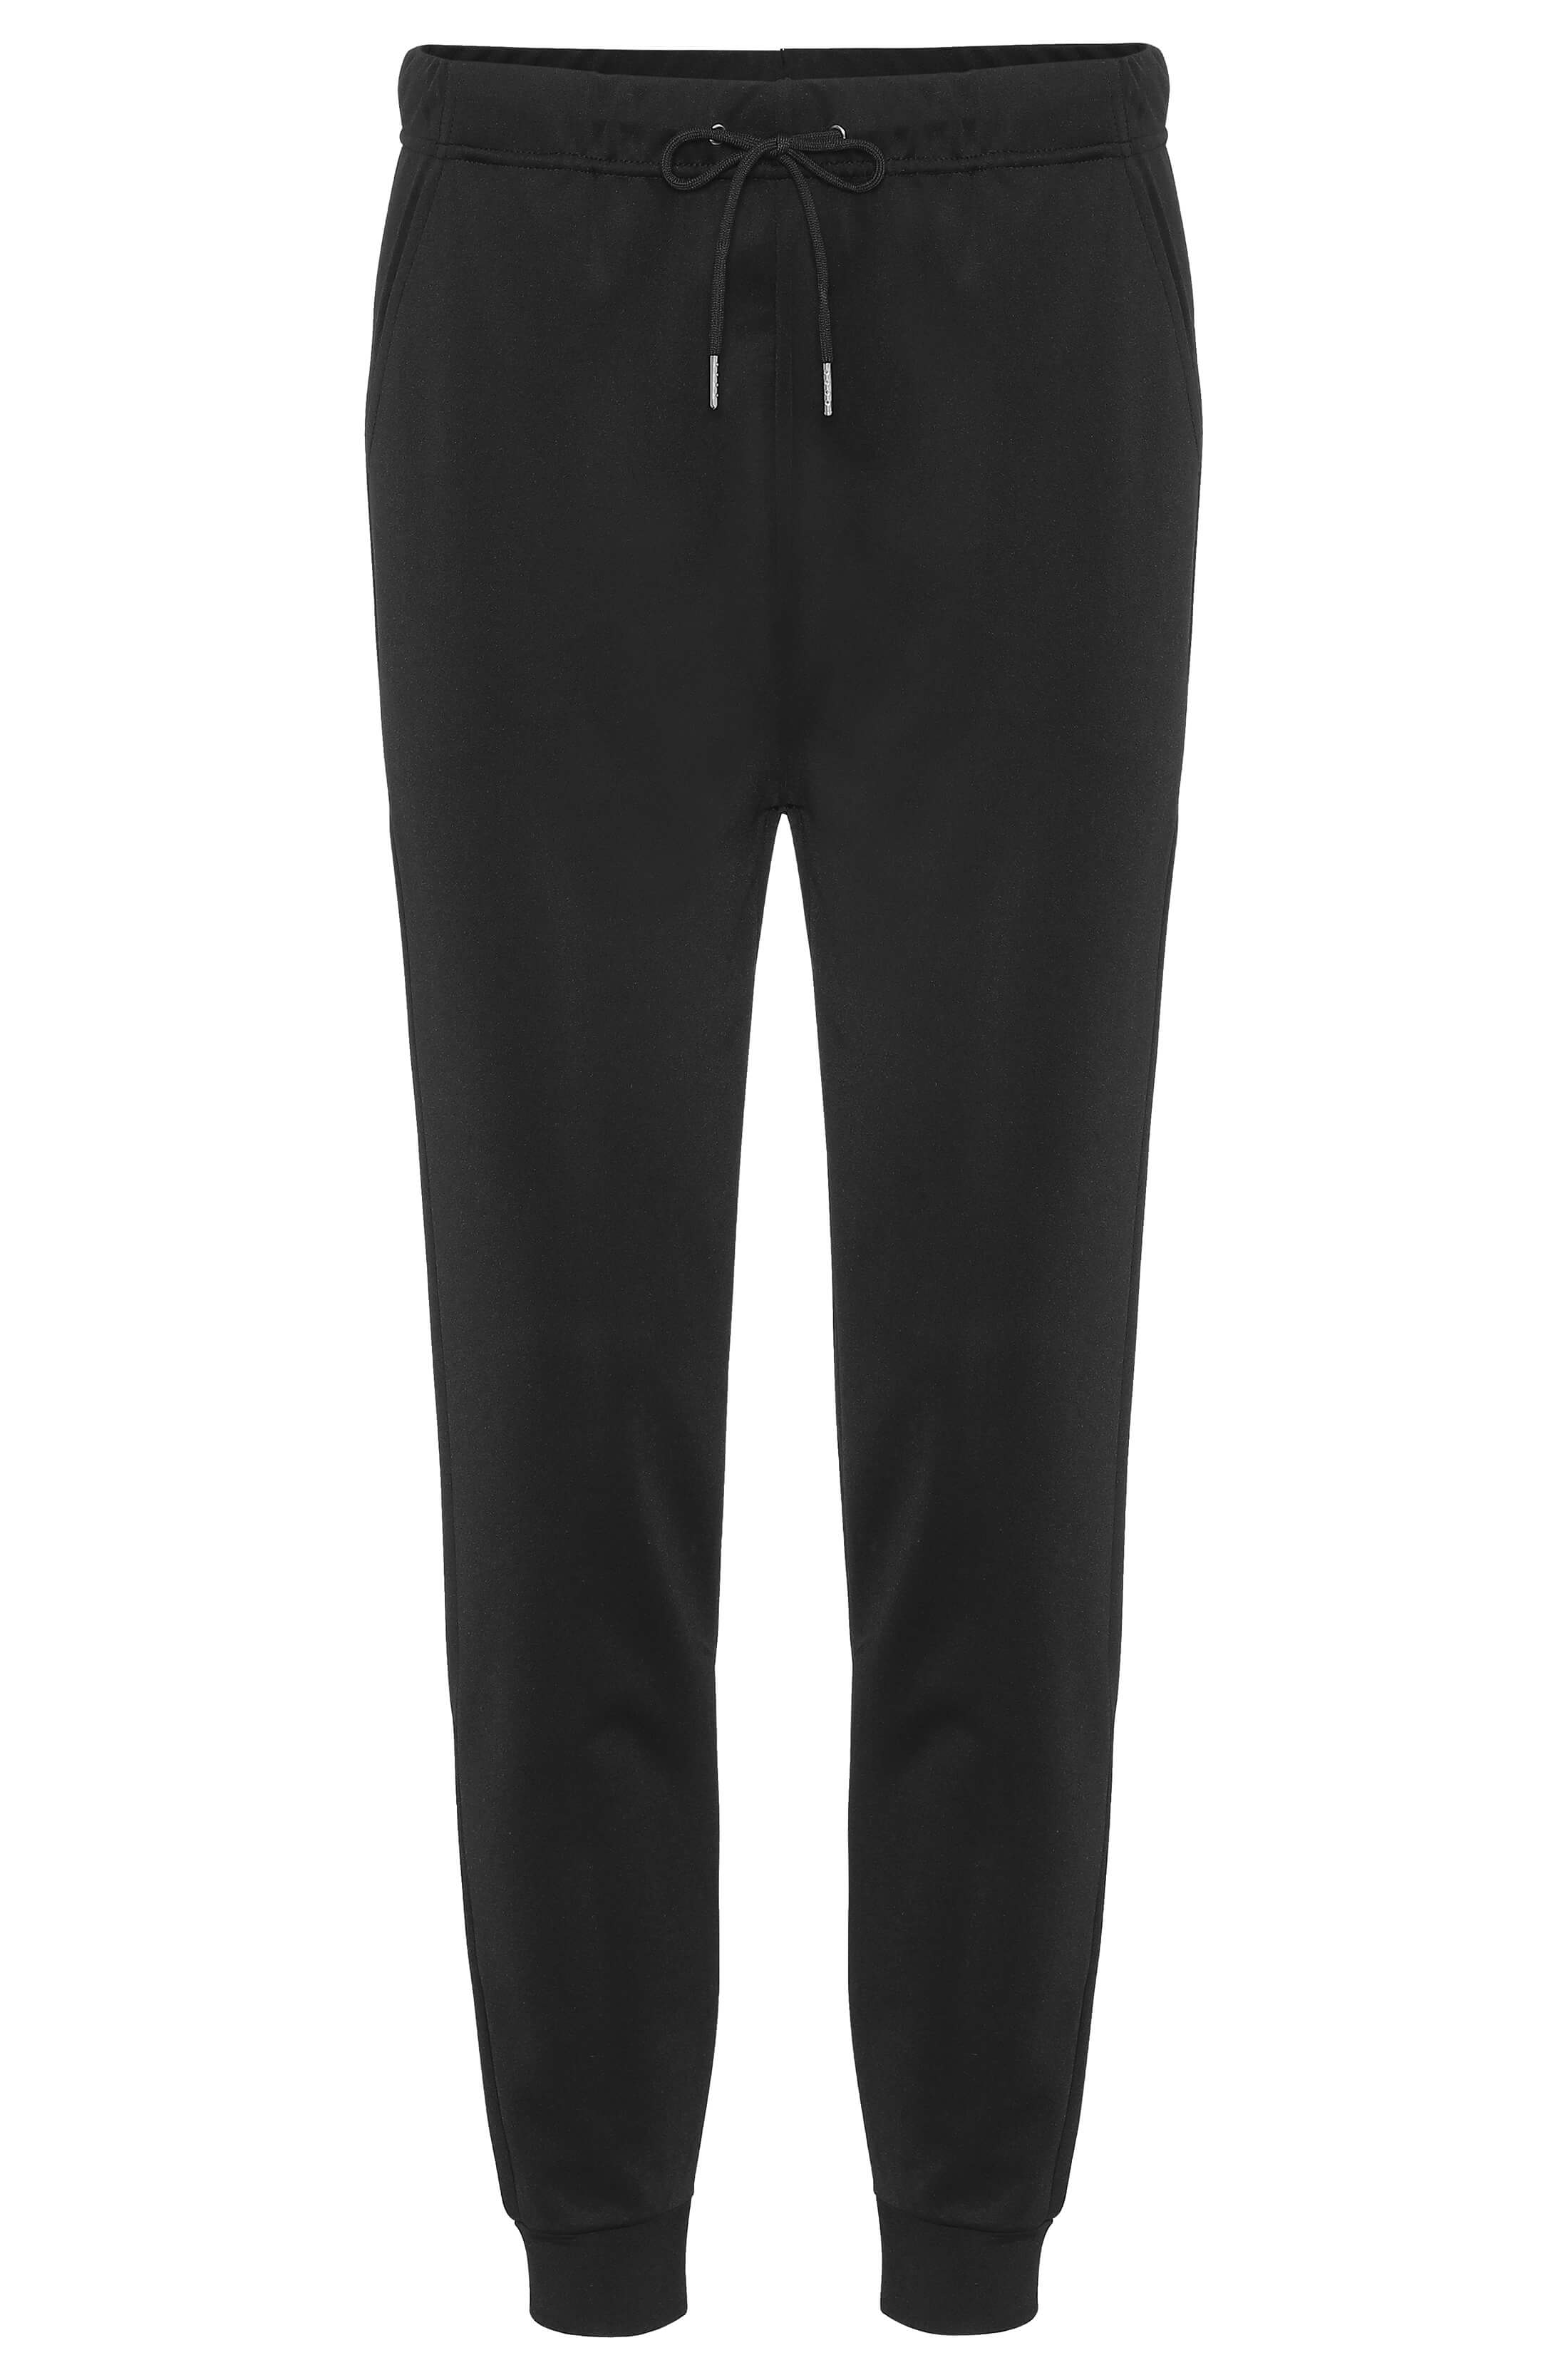 Comfortable black lounge pants